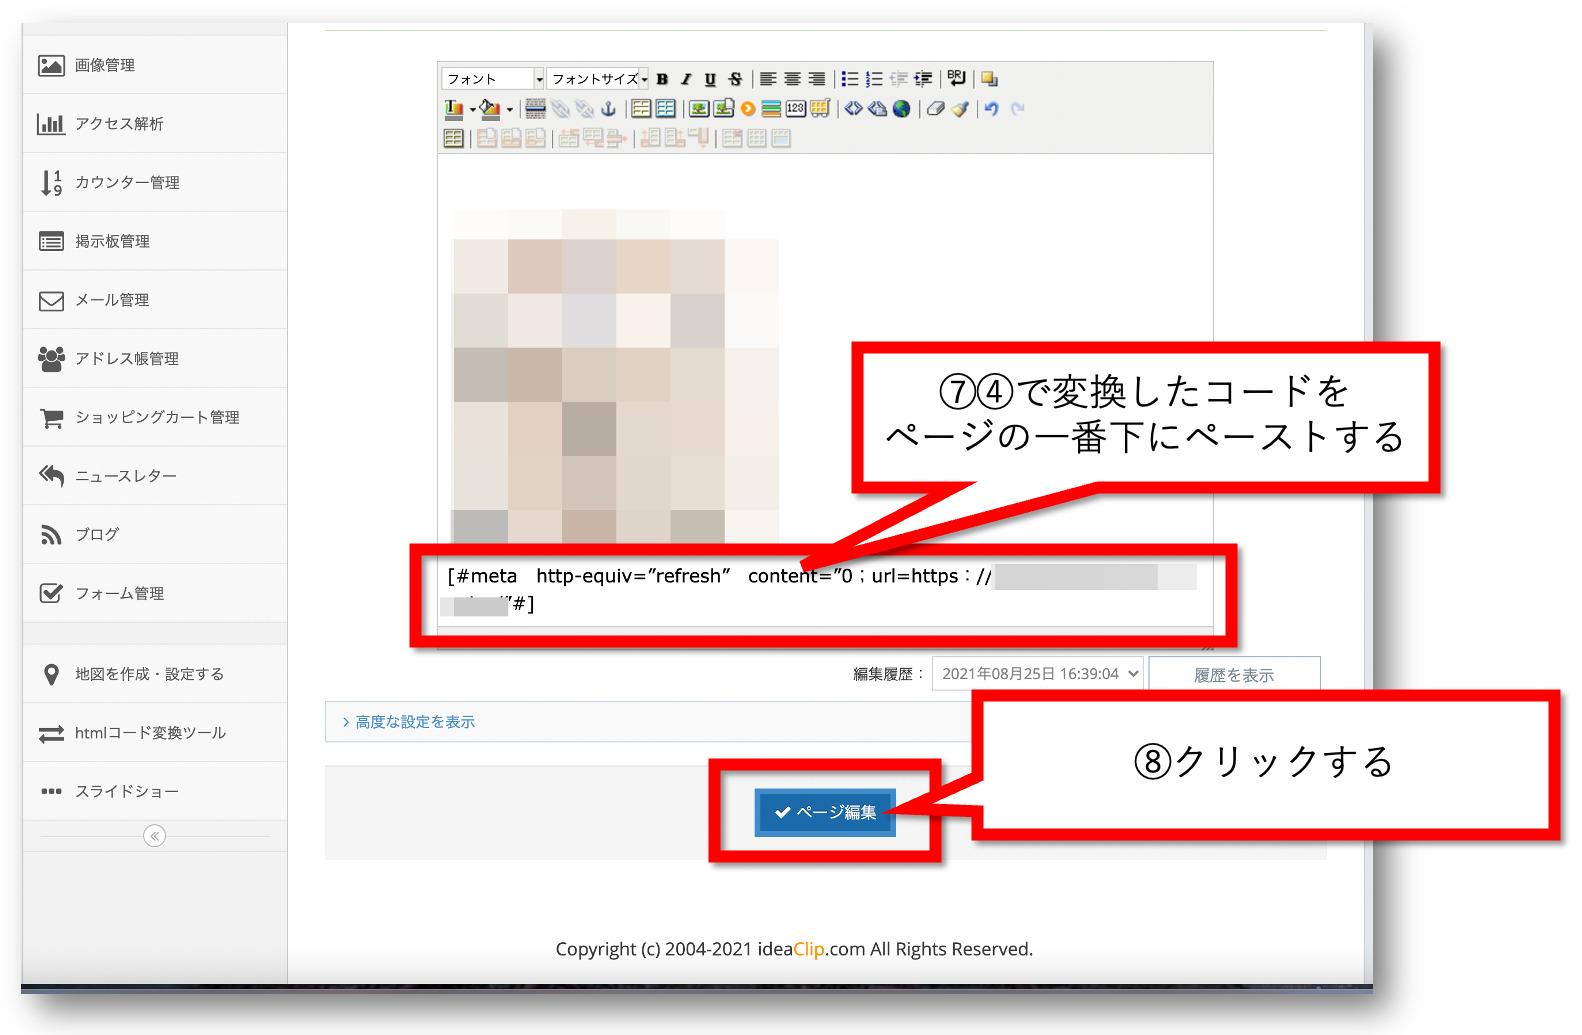 Pagekitで変換したmetaタグを挿入